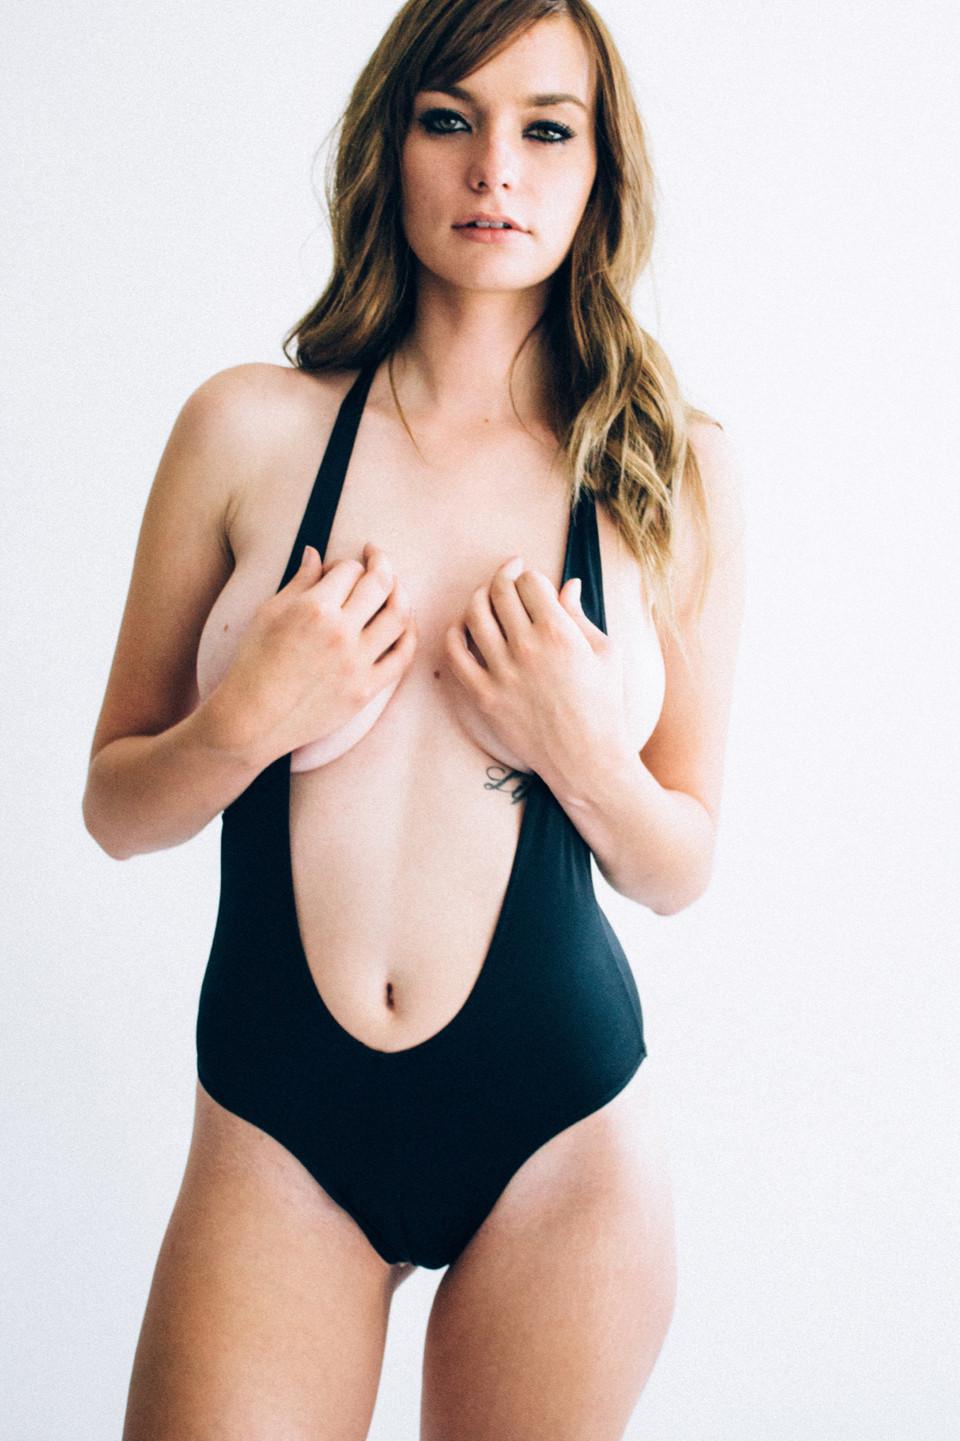 Photos Courtney Barnum nudes (54 foto and video), Sexy, Hot, Instagram, in bikini 2015